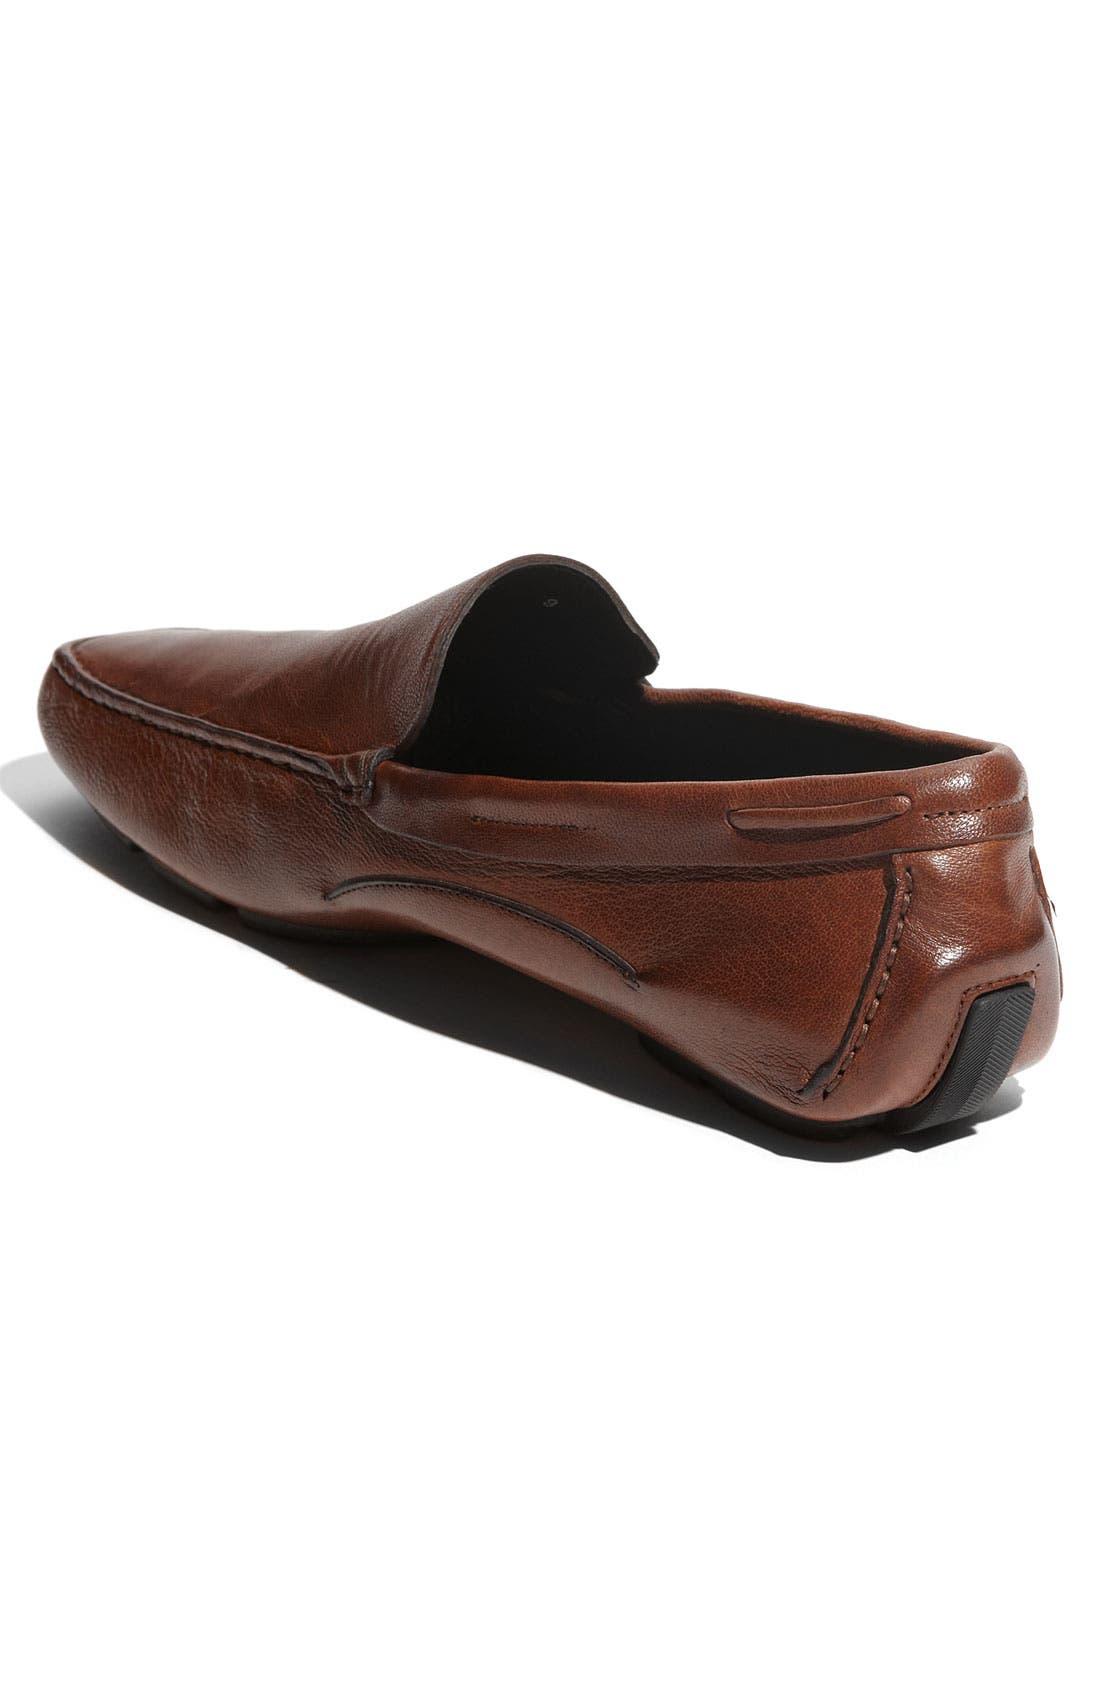 Alternate Image 3  - To Boot New York 'Barkley' Loafer